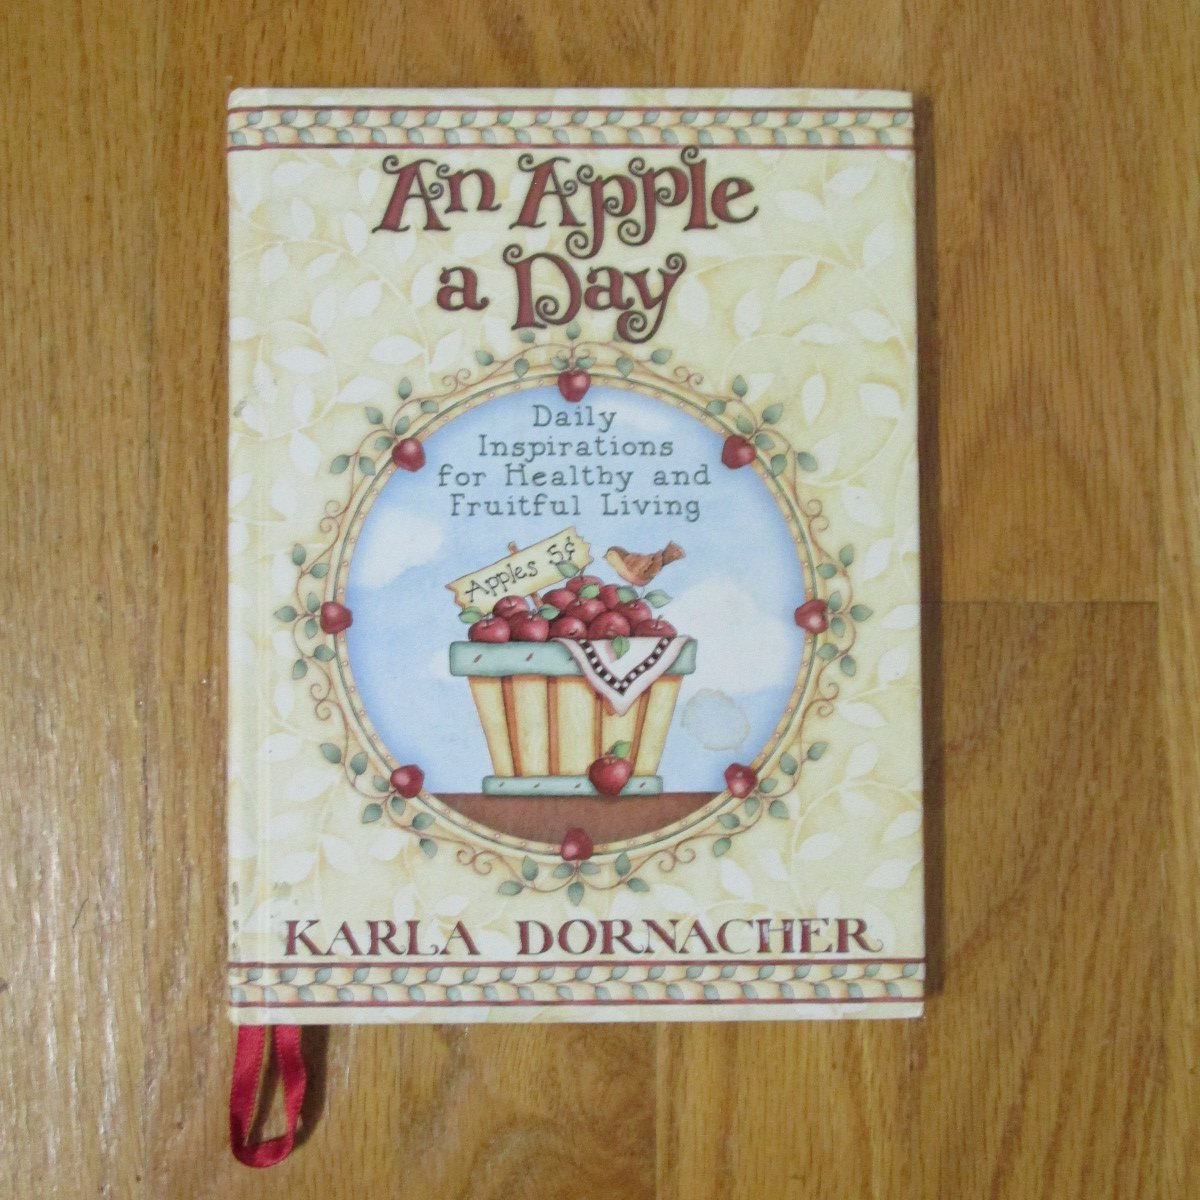 AN APPLE A DAY BOOK DAILY INSPIRATIONS HC KARLA DORNACHER 2002 THOMAS NELSON